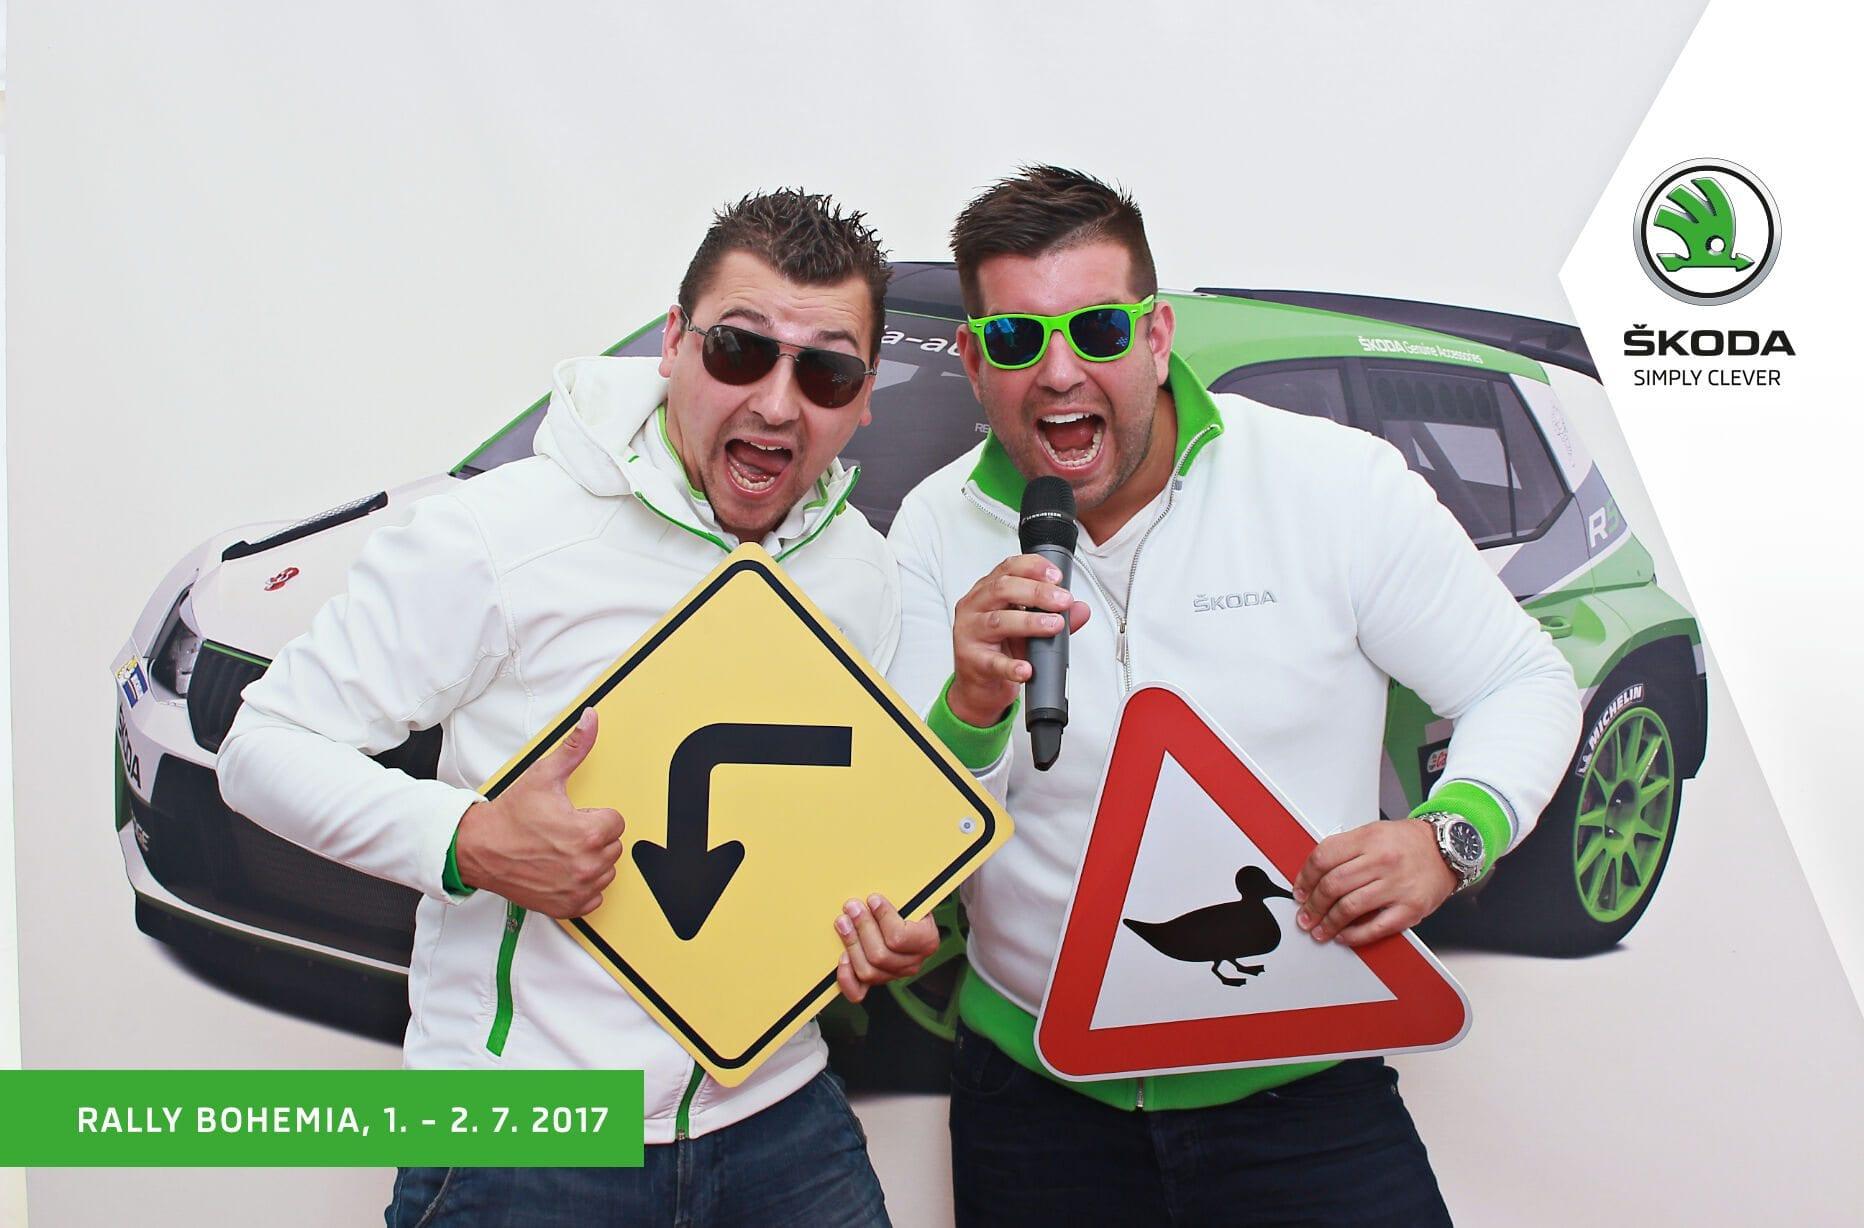 fotokoutek-skoda-rally-bohemia-2-7-2017-277458